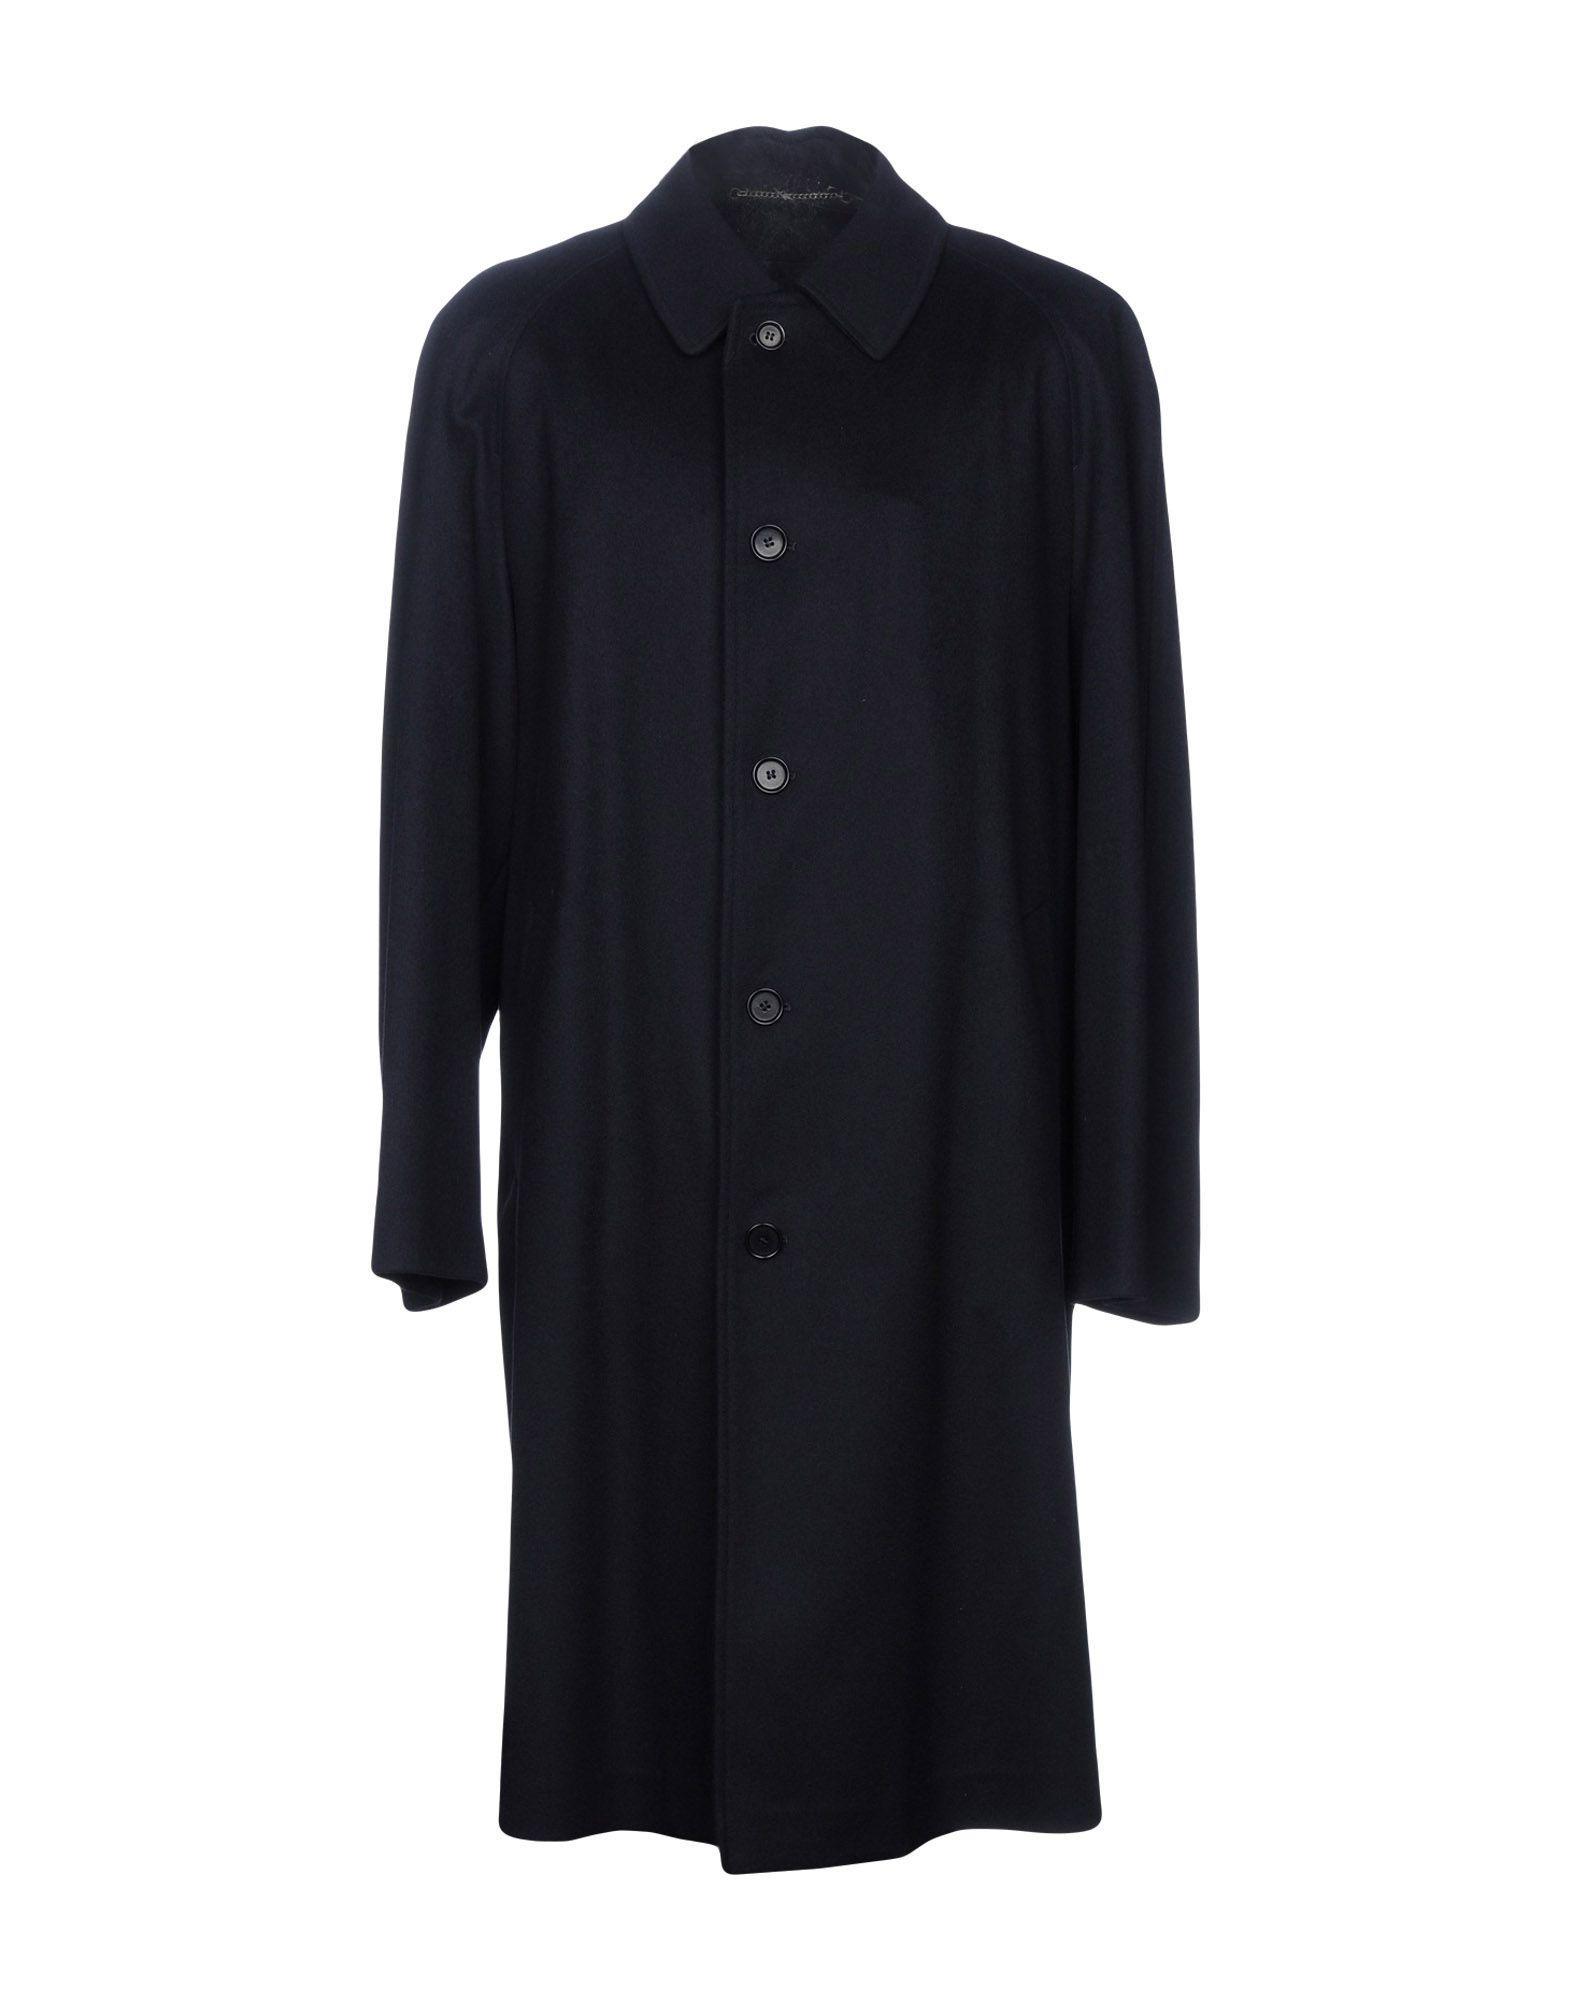 Schneiders Coat In Dark Blue